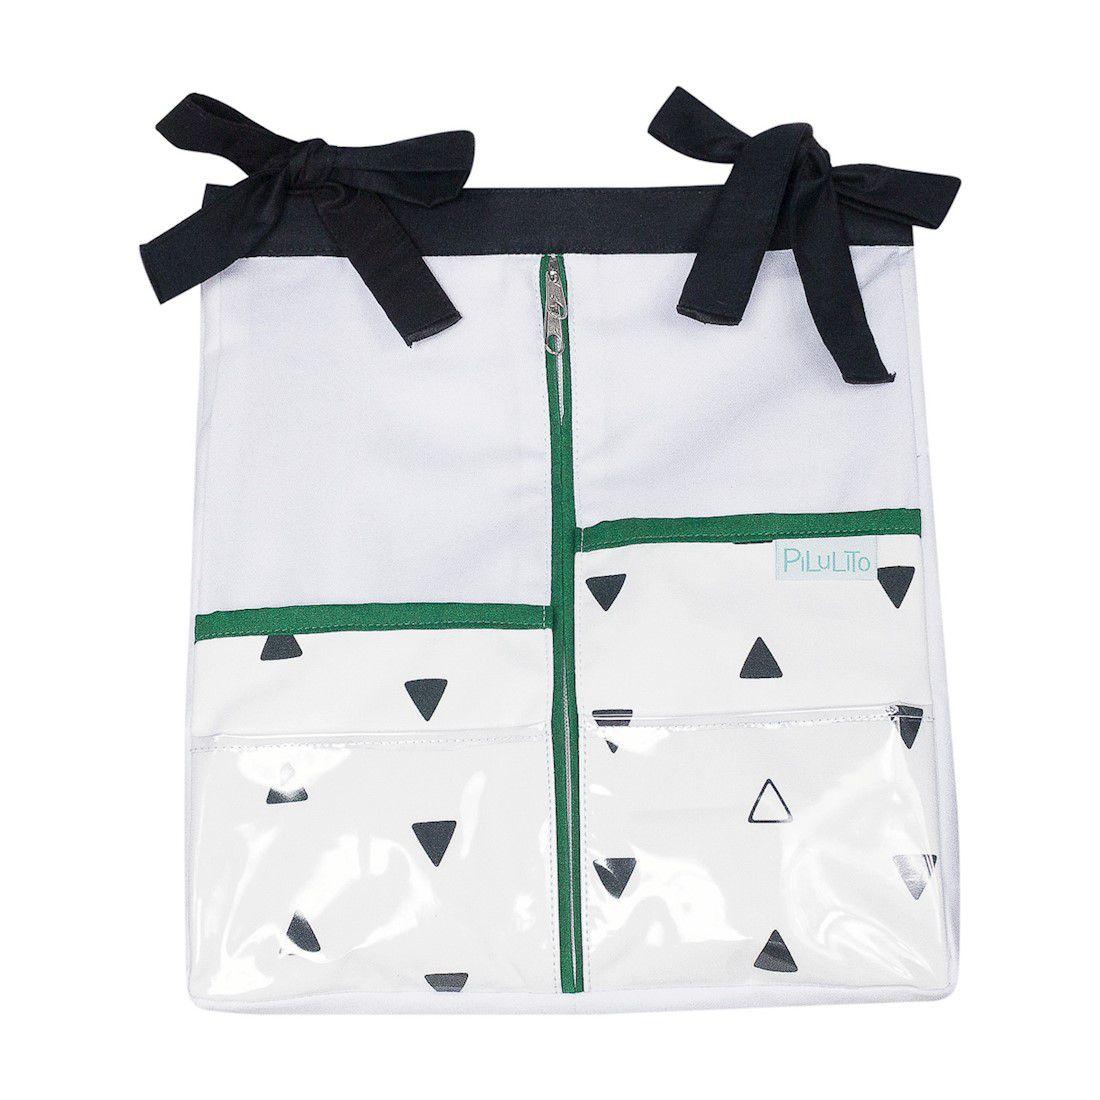 Porta-fraldas triângulos PB com verde malaquita